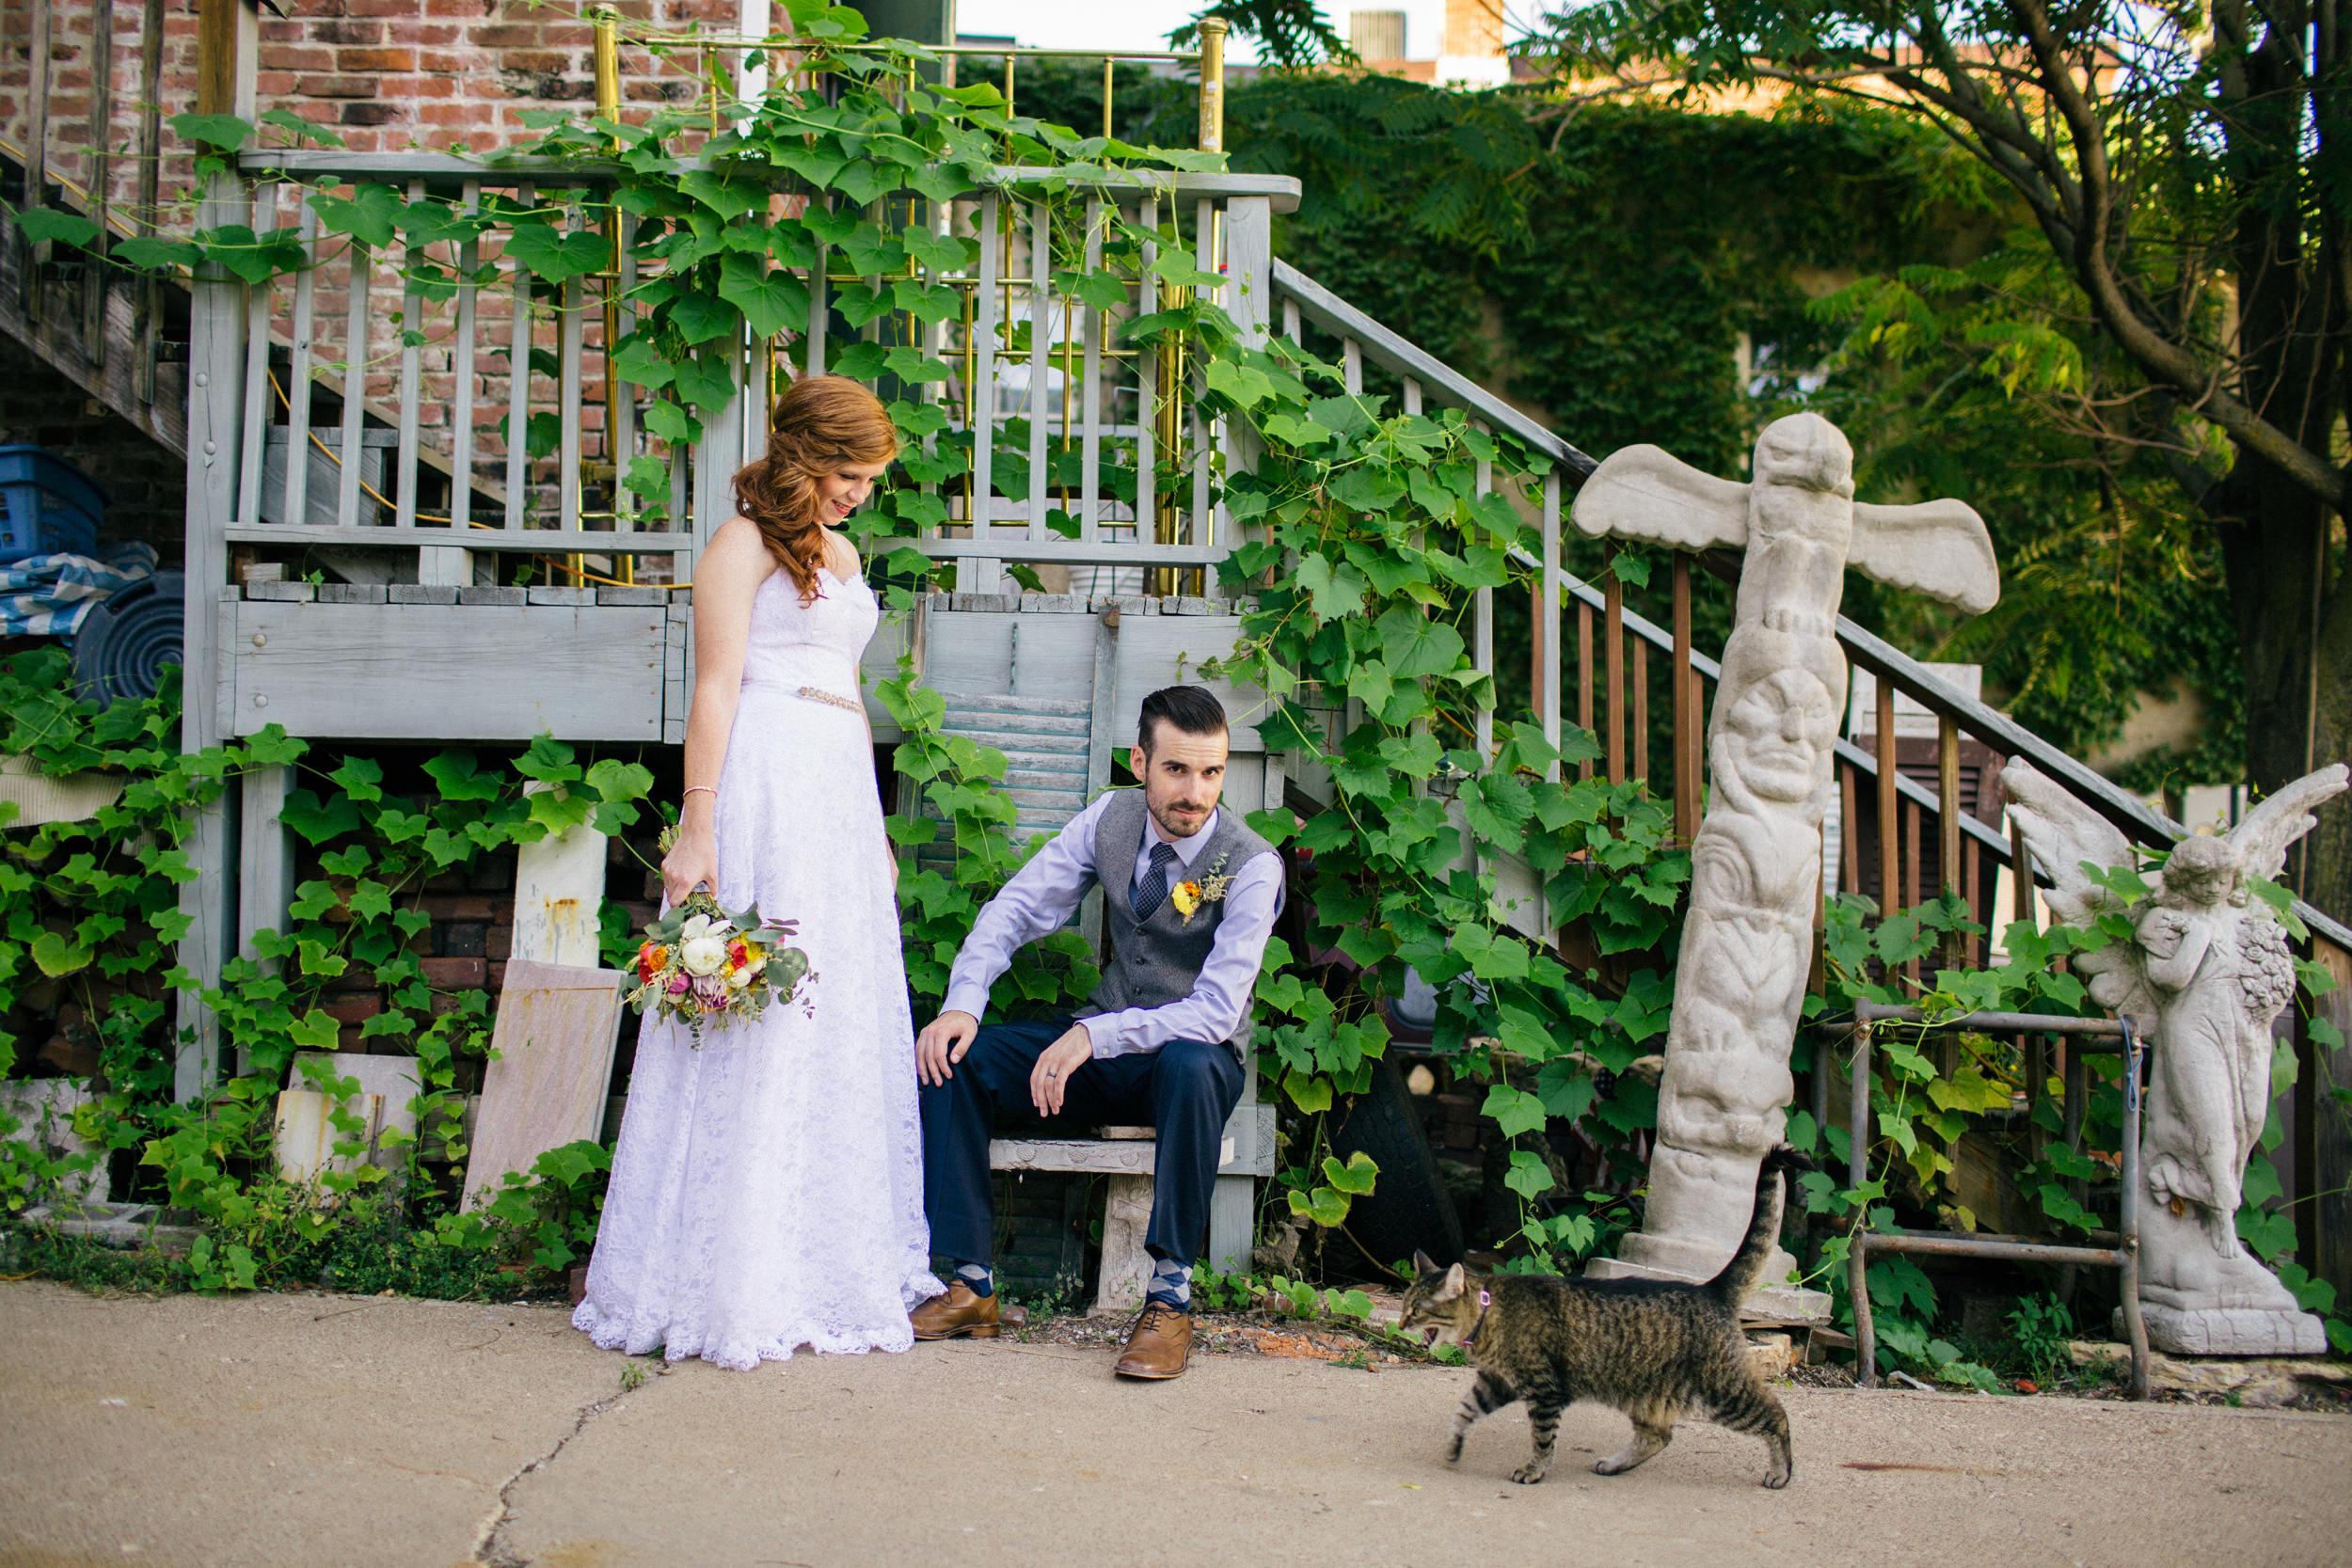 7-25-2015 Sarah and Jimmy's Eagle Ridge Downtown Galena Wedding-172.jpg